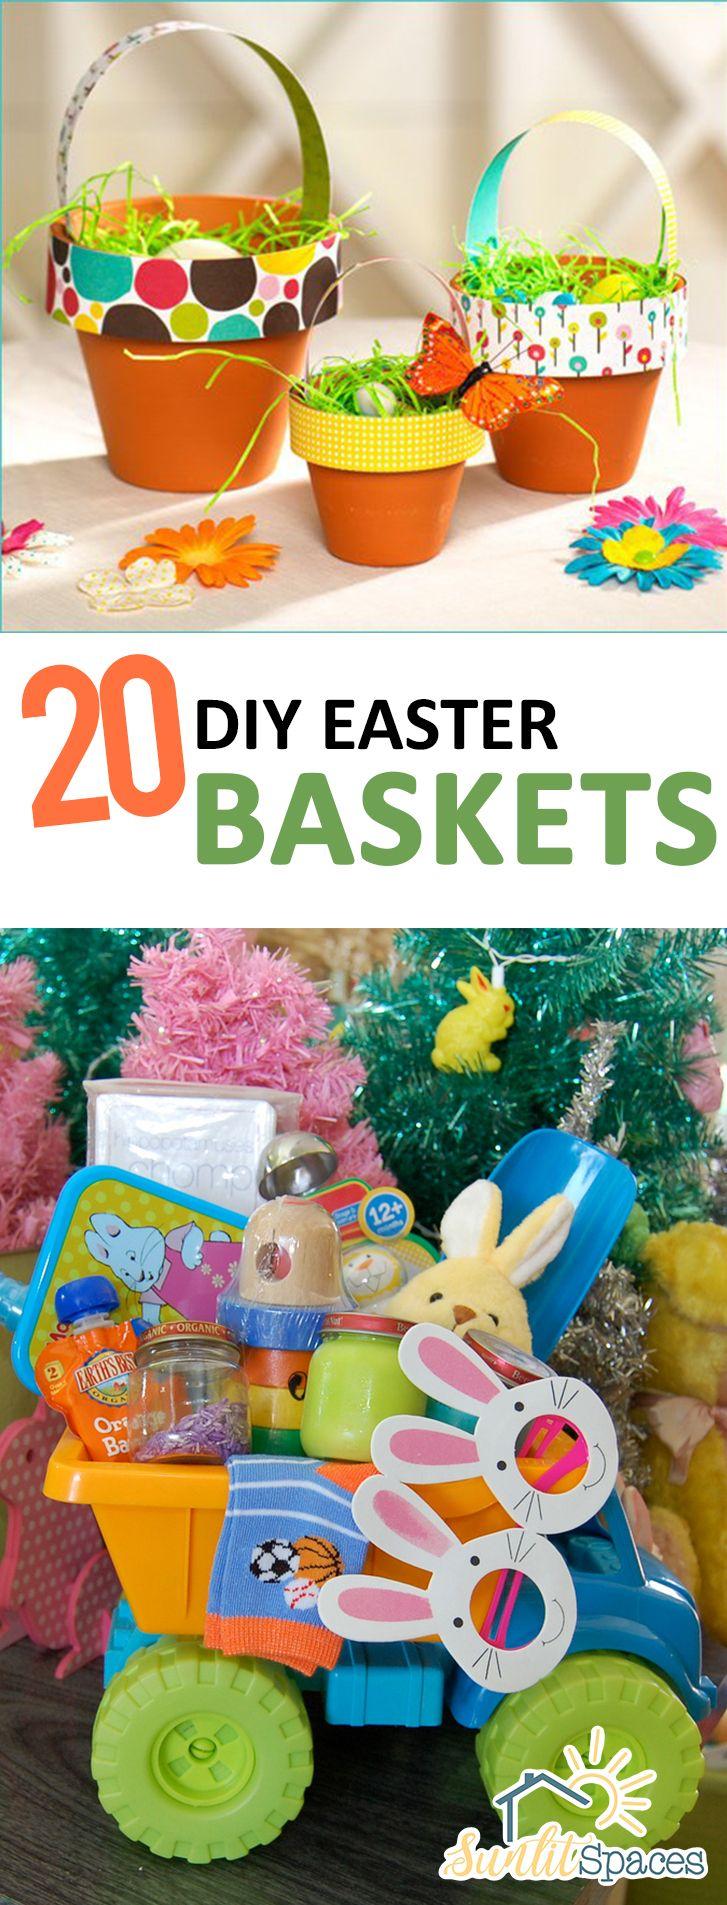 Easter Baskets, Homemade Easter Baskets, Easter Baskets, Easter, Easter Baskets for Less, Cheap Easter Baskets, Easter Gifts, Easter Gifts for Cheap, Cheap Easter Baskets, Popular Pin